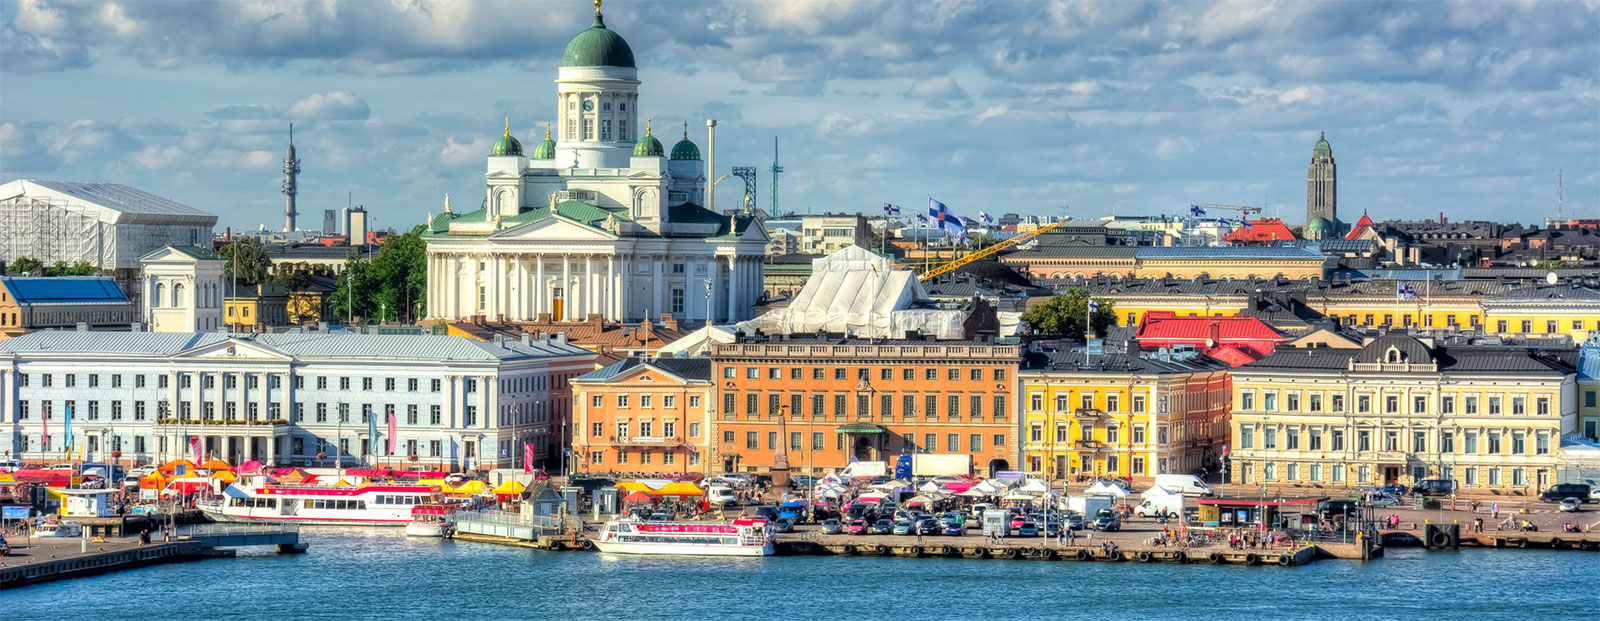 هلسینکی فنلاند